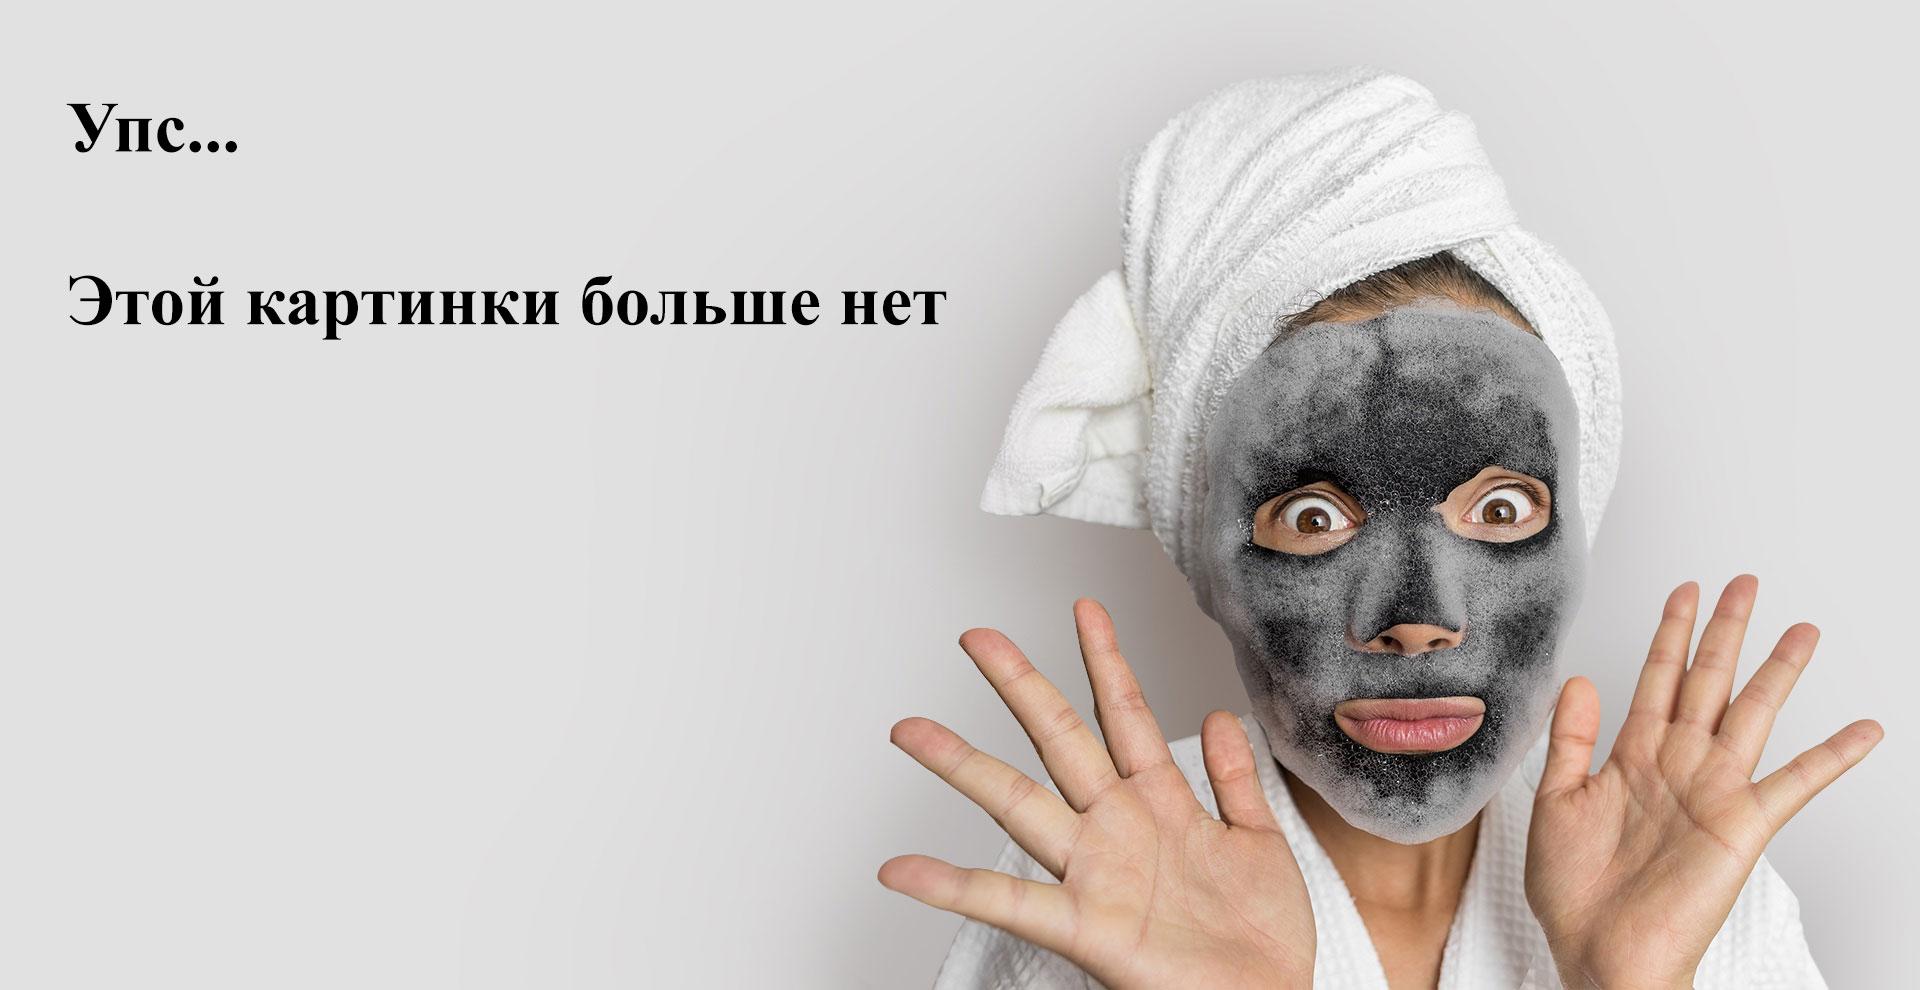 PROFHENNA, Масло для бровей и ресниц «Усьма», 10 мл